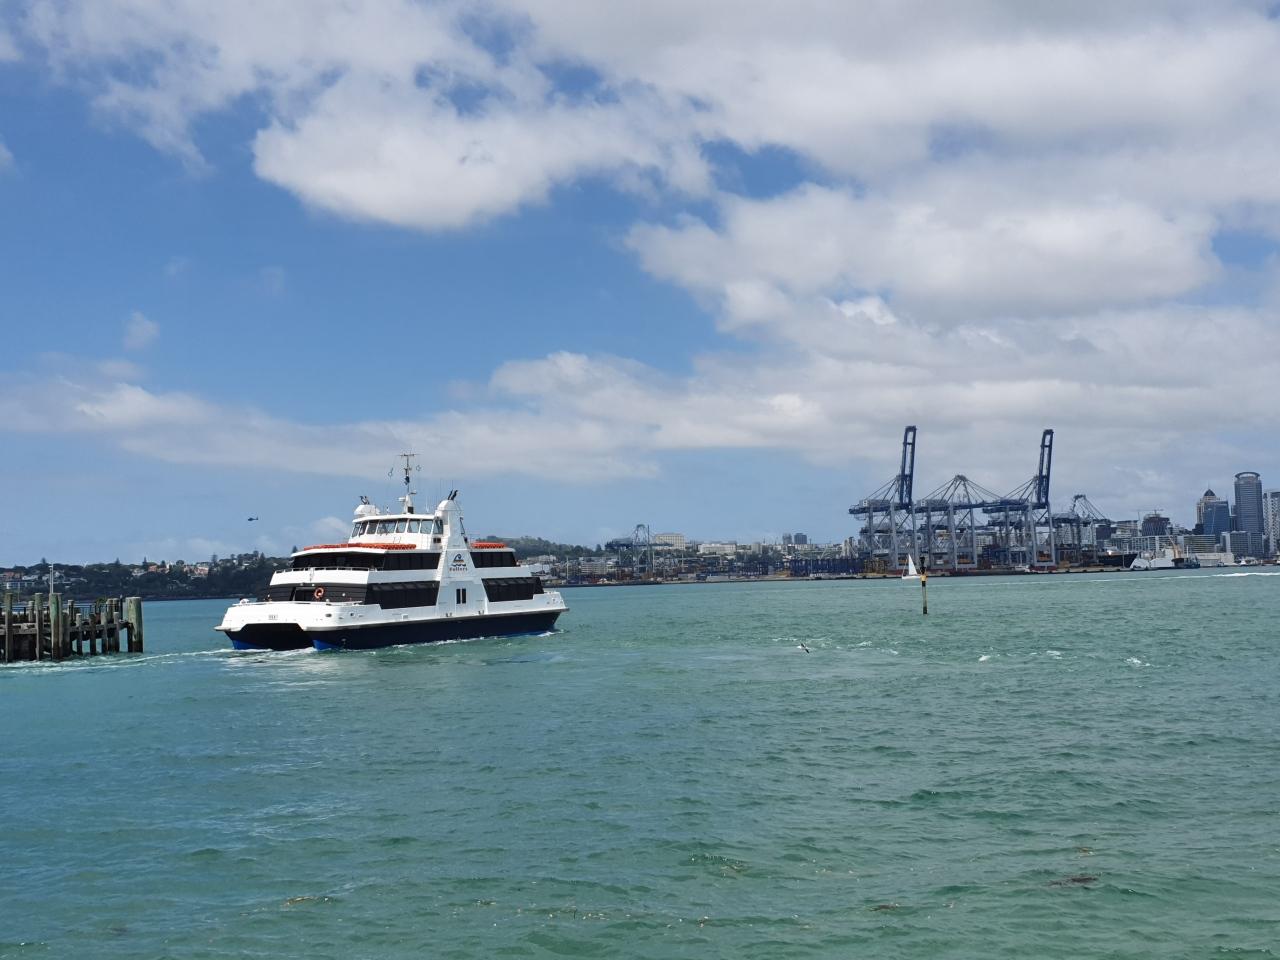 Day 105: Catamaran to Devonport and the navalmuseum